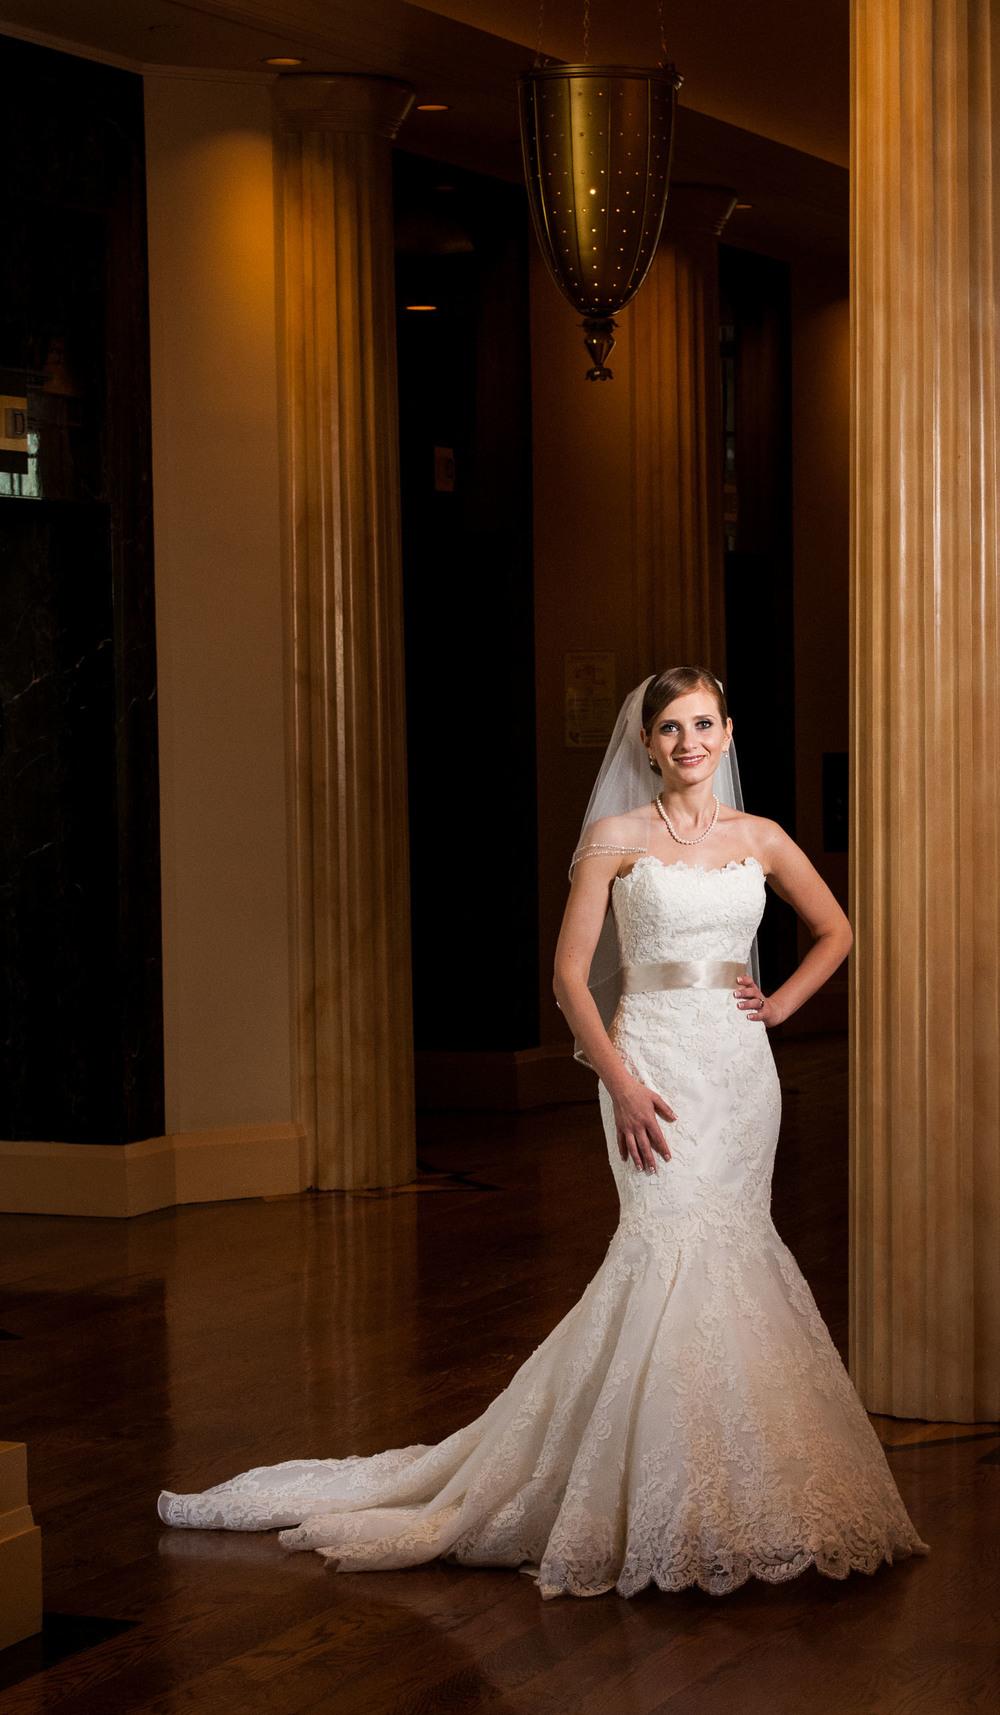 stewart_bertrand_wedding_photography_sp-1007.jpg